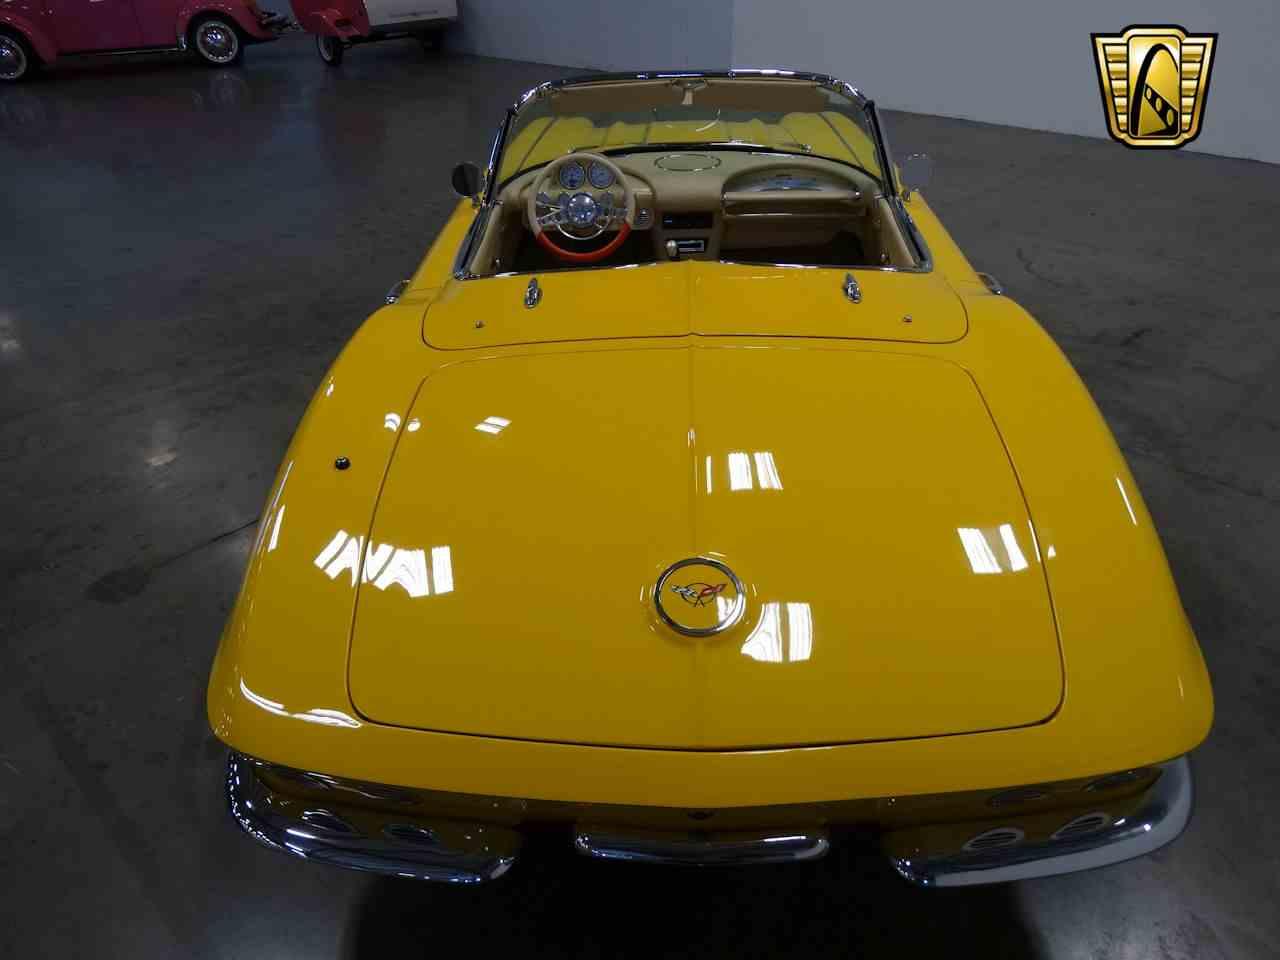 Large Picture of 1962 Chevrolet Corvette located in La Vergne Tennessee - $210,000.00 - M2LR